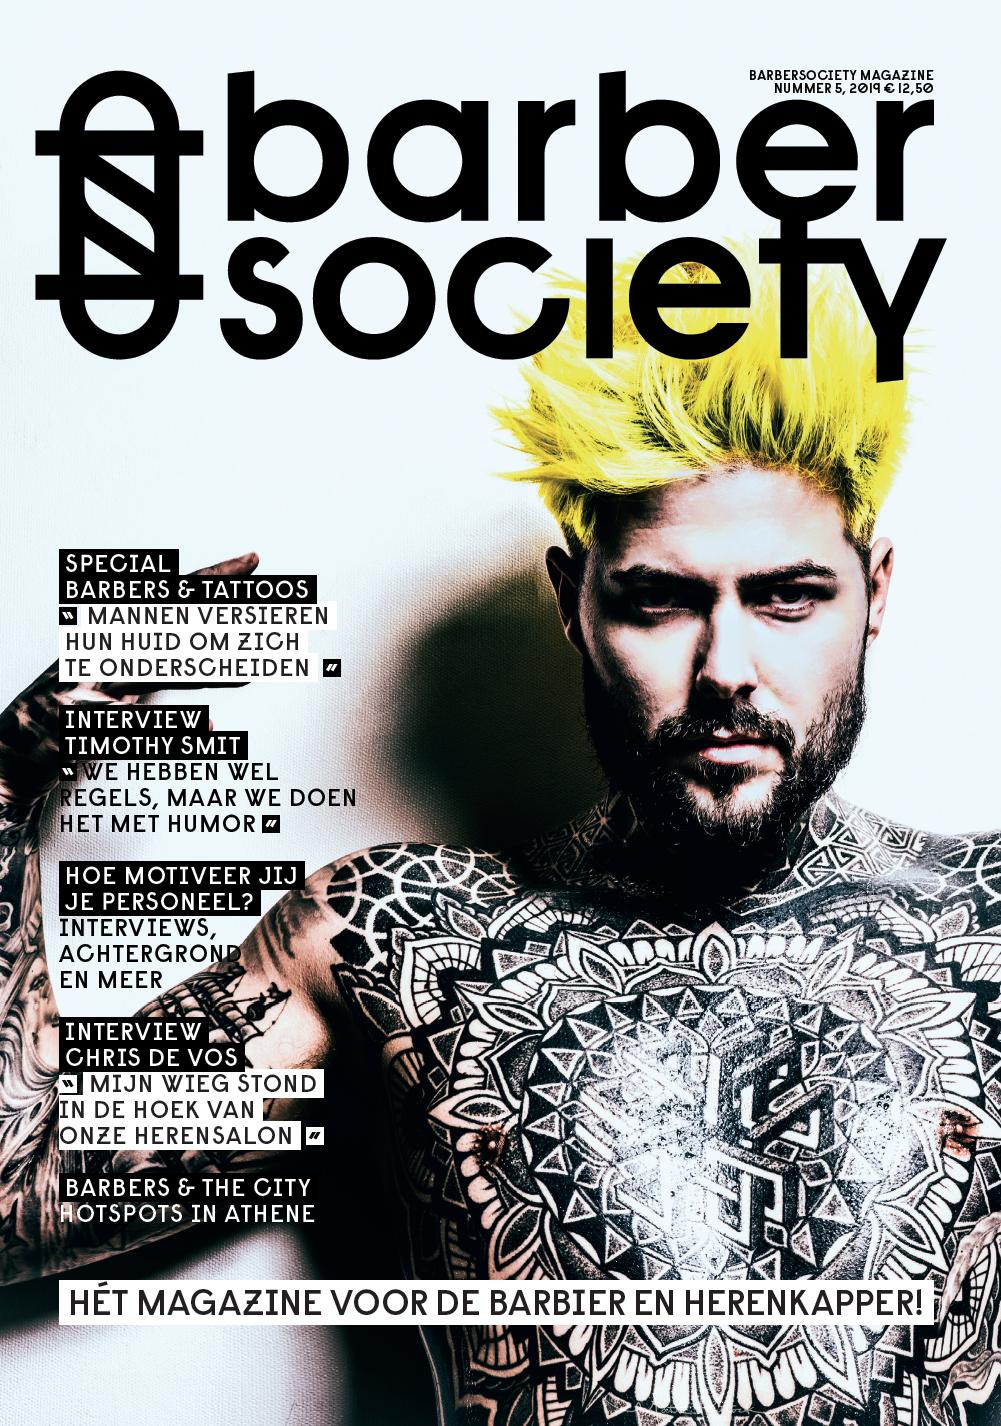 Cover #5 2019 kopie.png